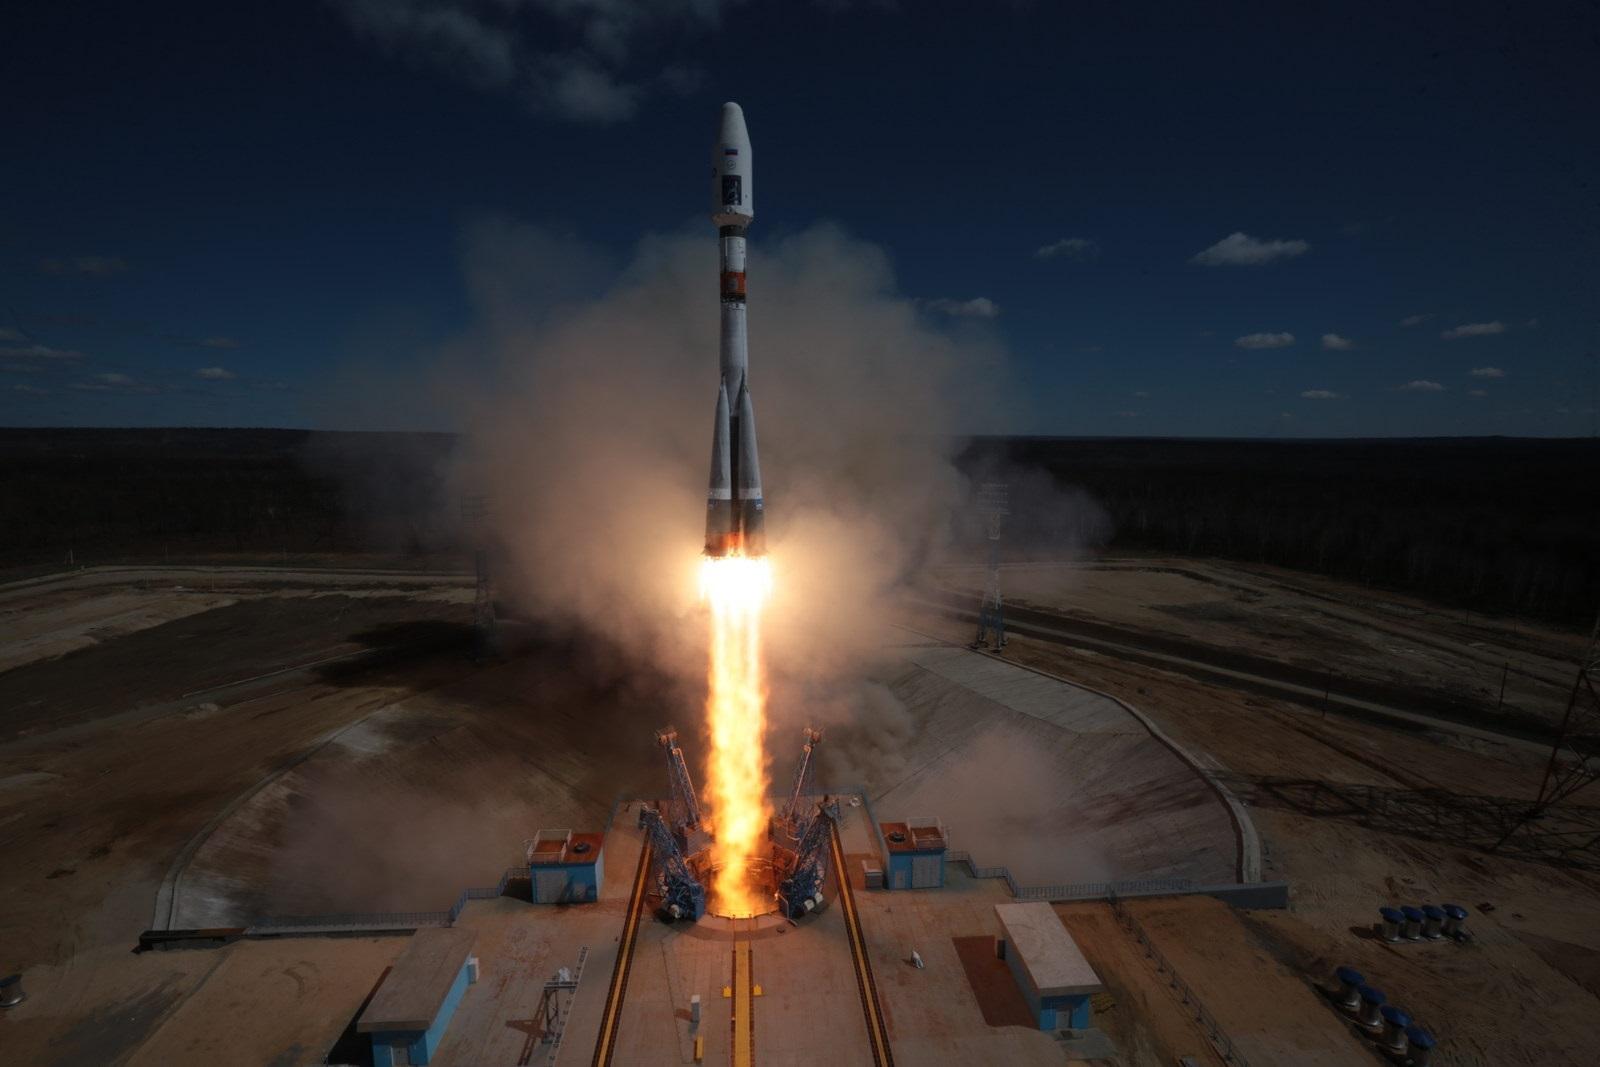 Vostochny - Nouveau cosmodrome russe - Vol inaugural - Soyouz - 28 avril 2016 - Vladimir Poutine